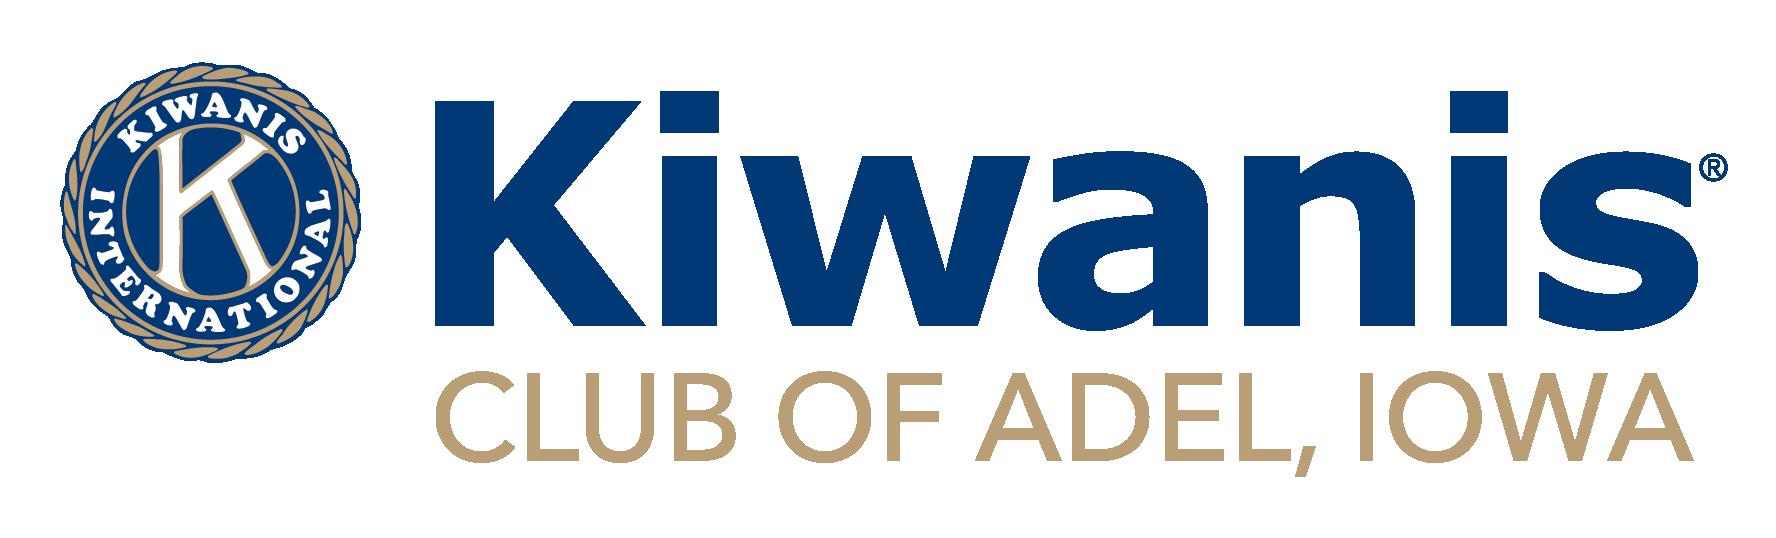 Kiwanis Club of Adel, Iowa